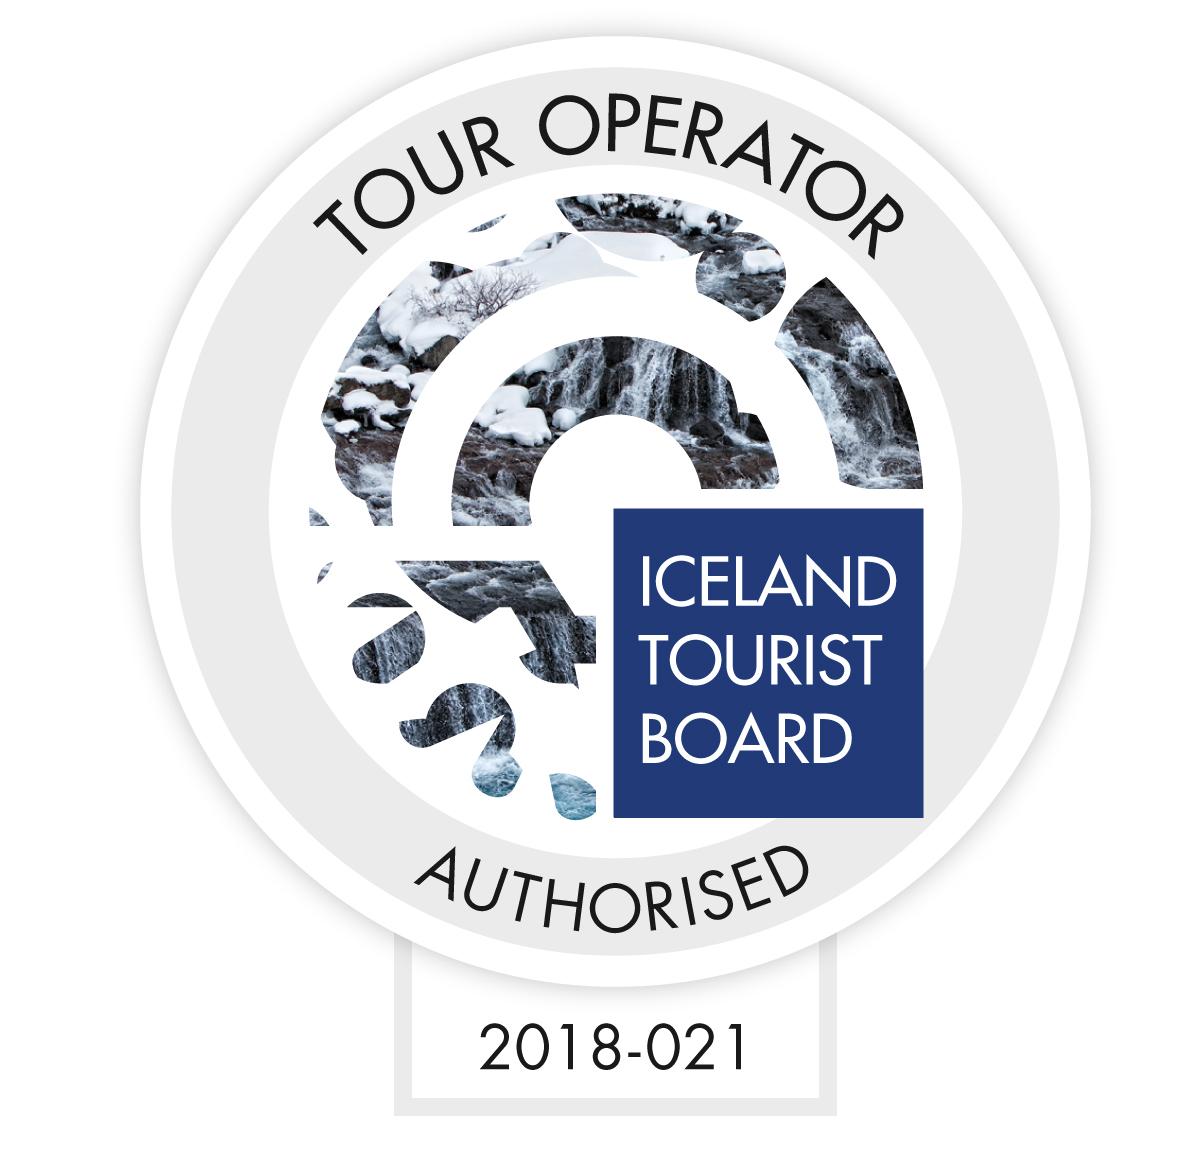 iceland-tourist-board-logo-021.jpg